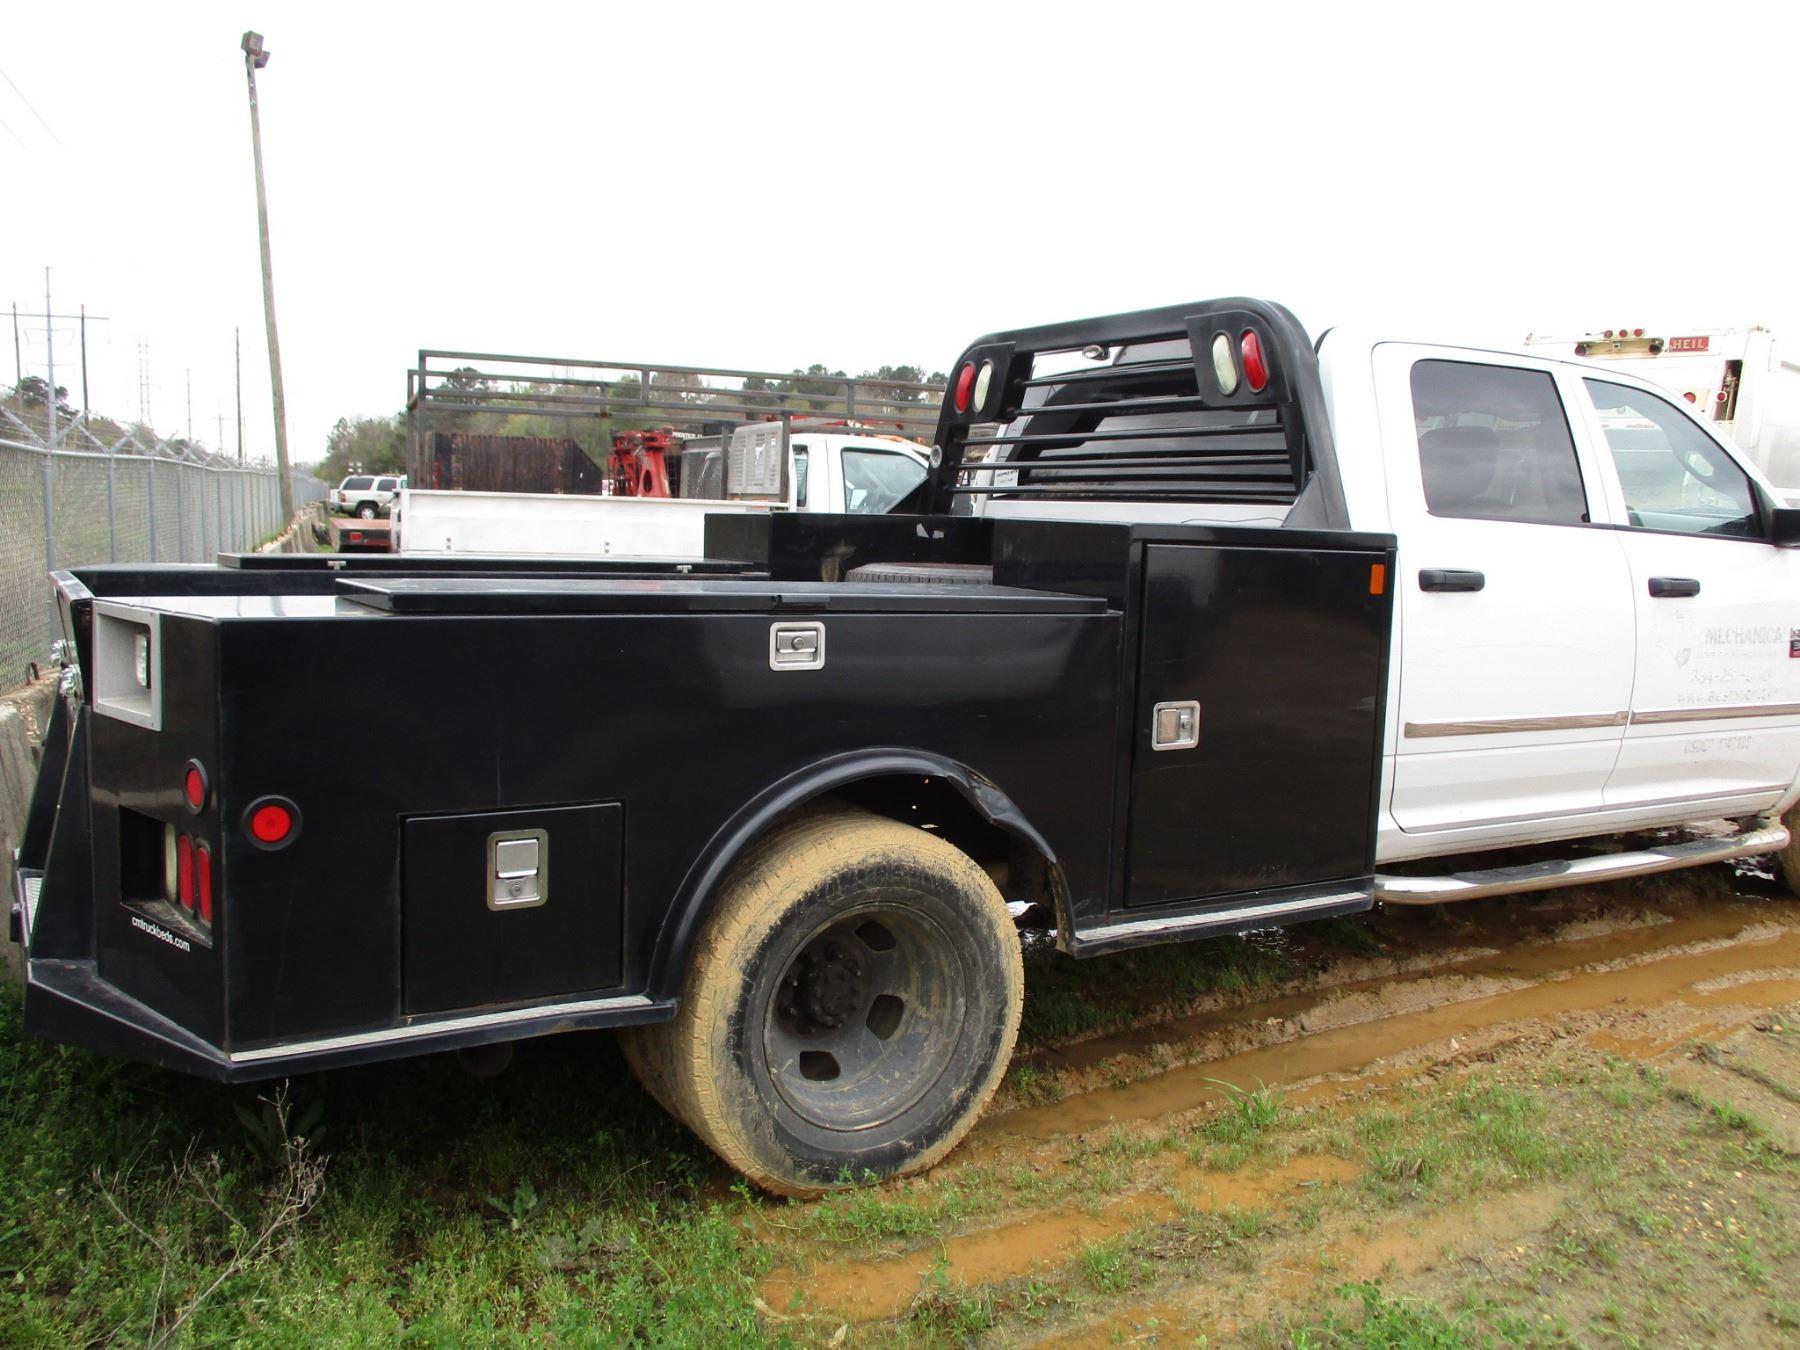 2012 Dodge Ram 3500 Flatbed Truck Vin Sn 3c7wdscl2cg304157 Crew Cab Cummins Turbo Diesel Engine